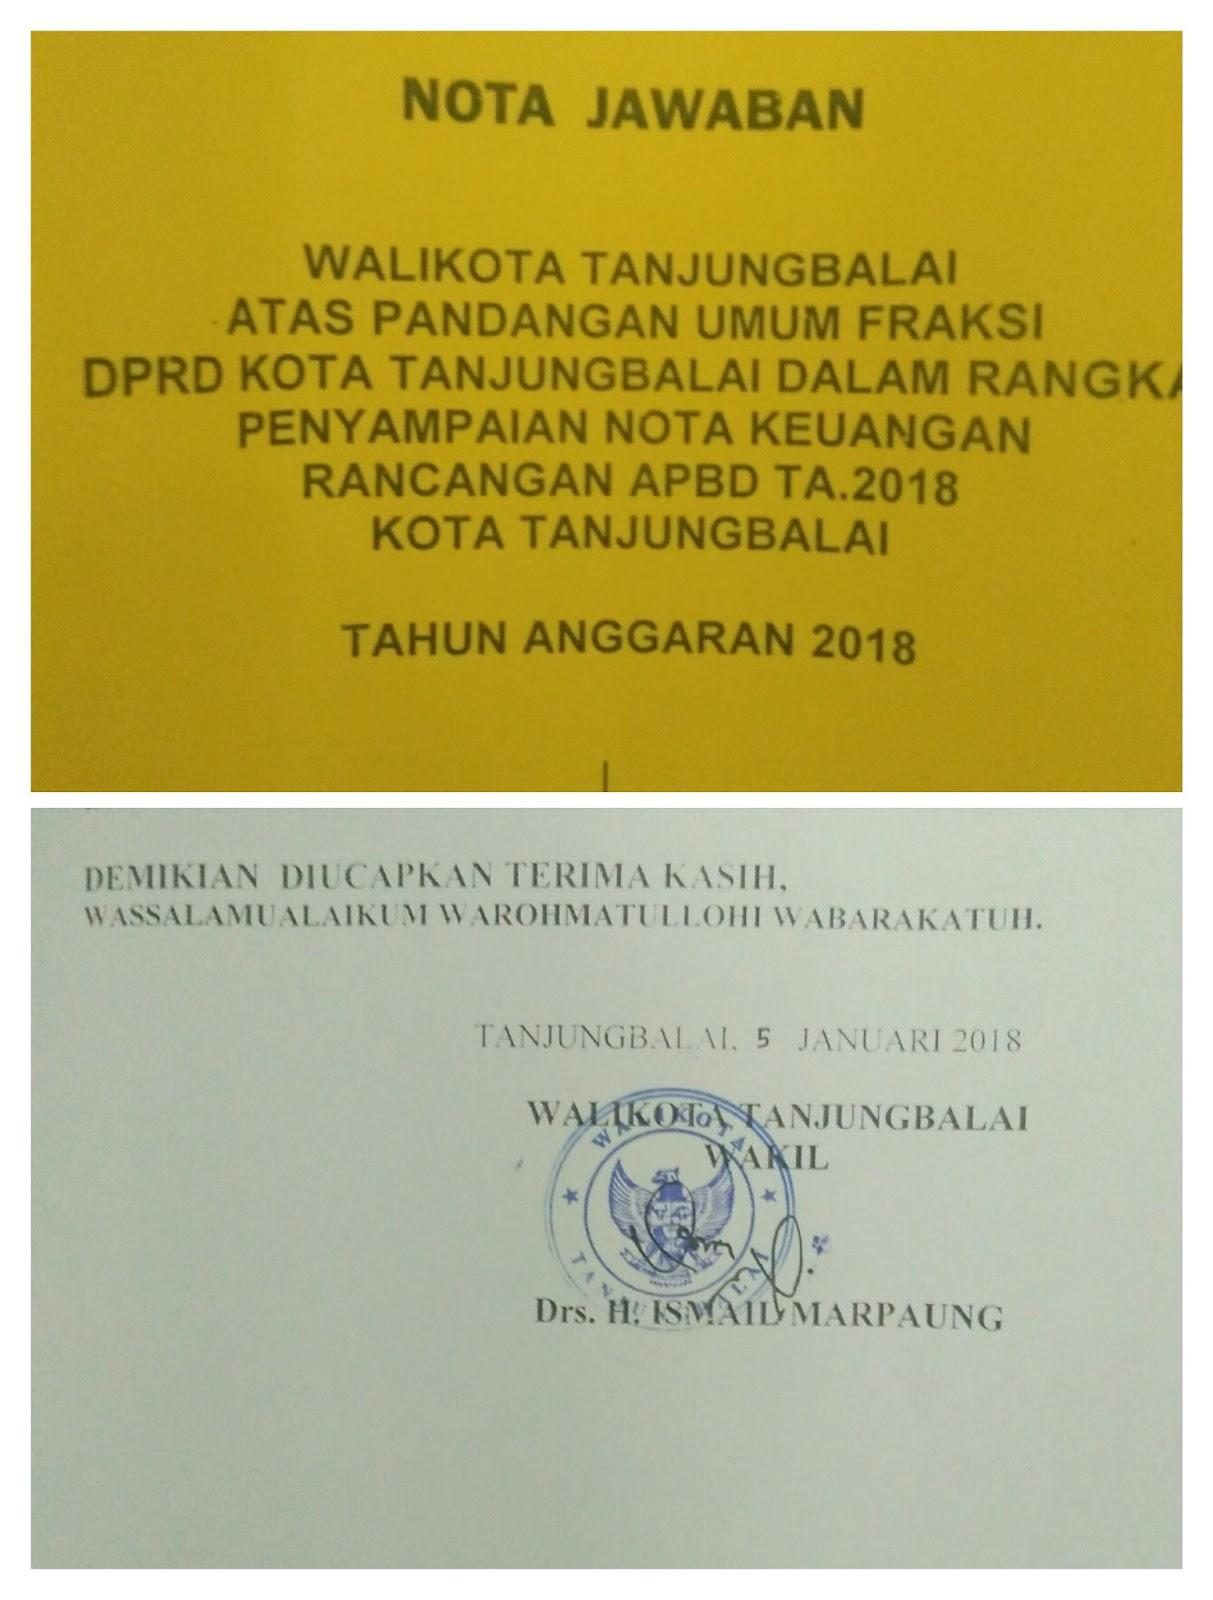 Nota Jawaban Walikota akan tetapi ditandatangani oleh Wakil Walikota Tanjungbalai Drs H Ismail.